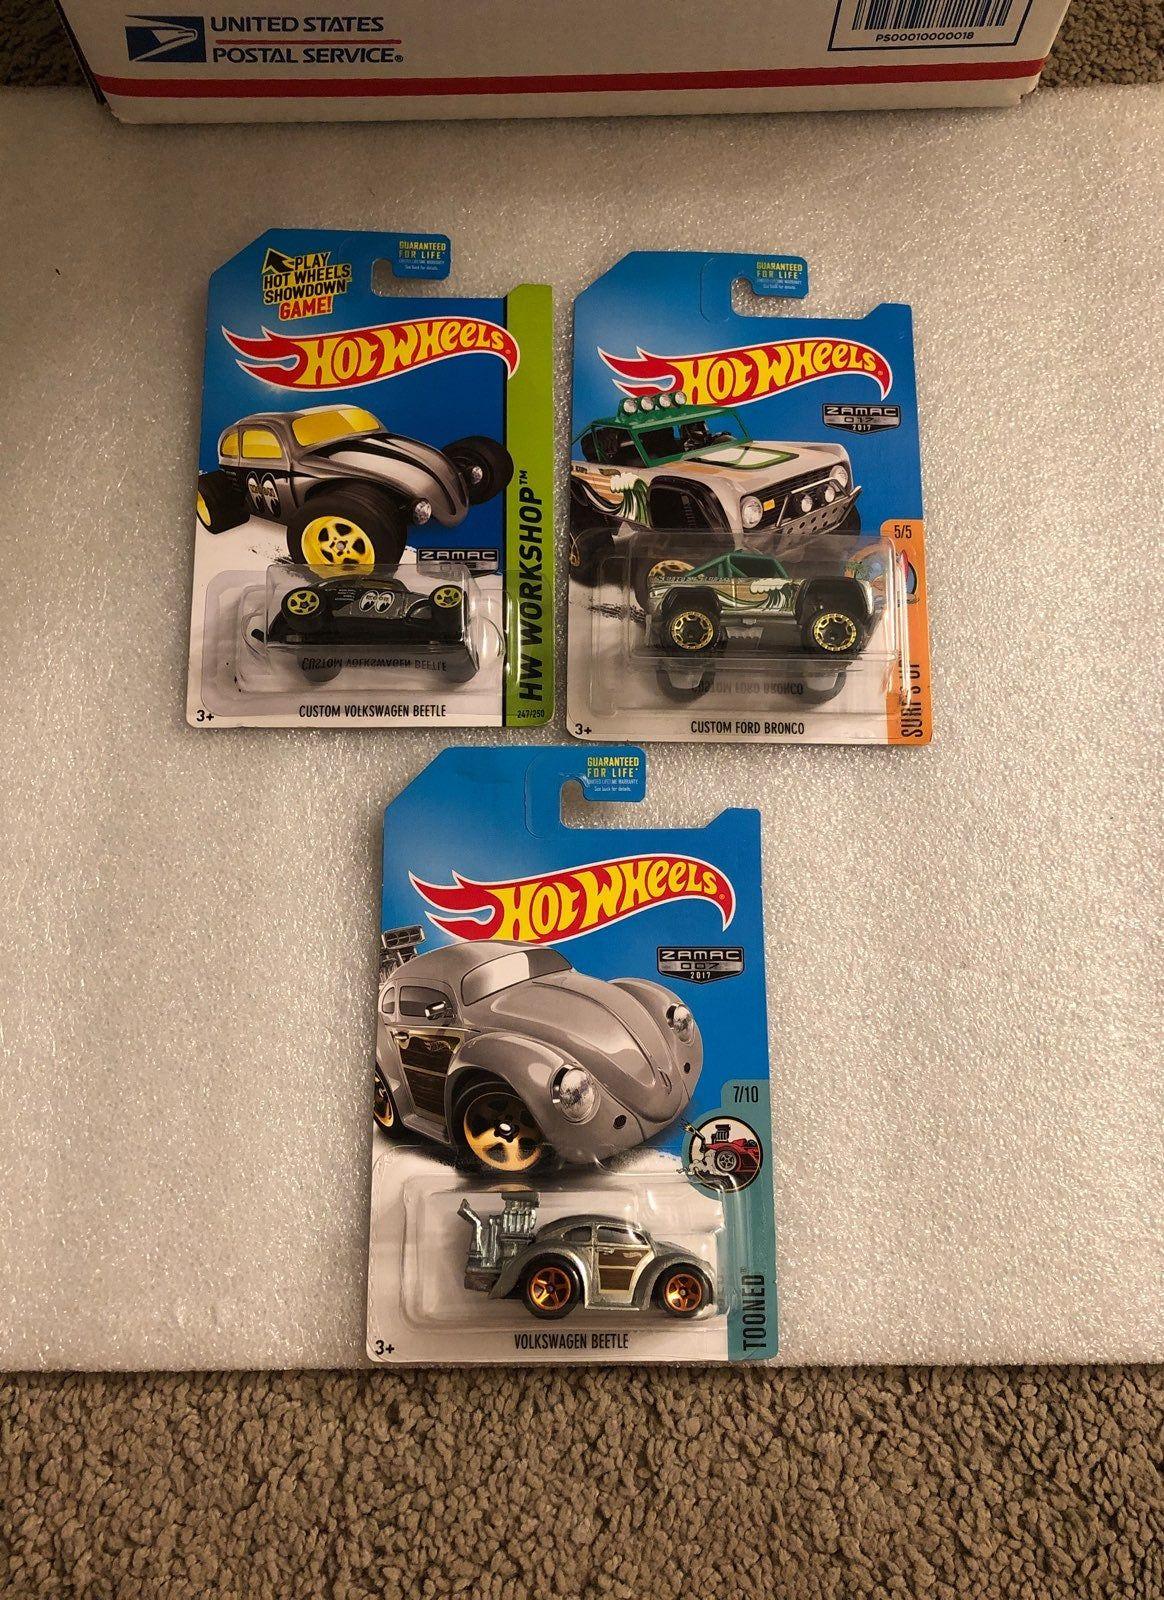 I Got These Zamac Hotwheel Set Which Are Custom Volkswagen Beetle